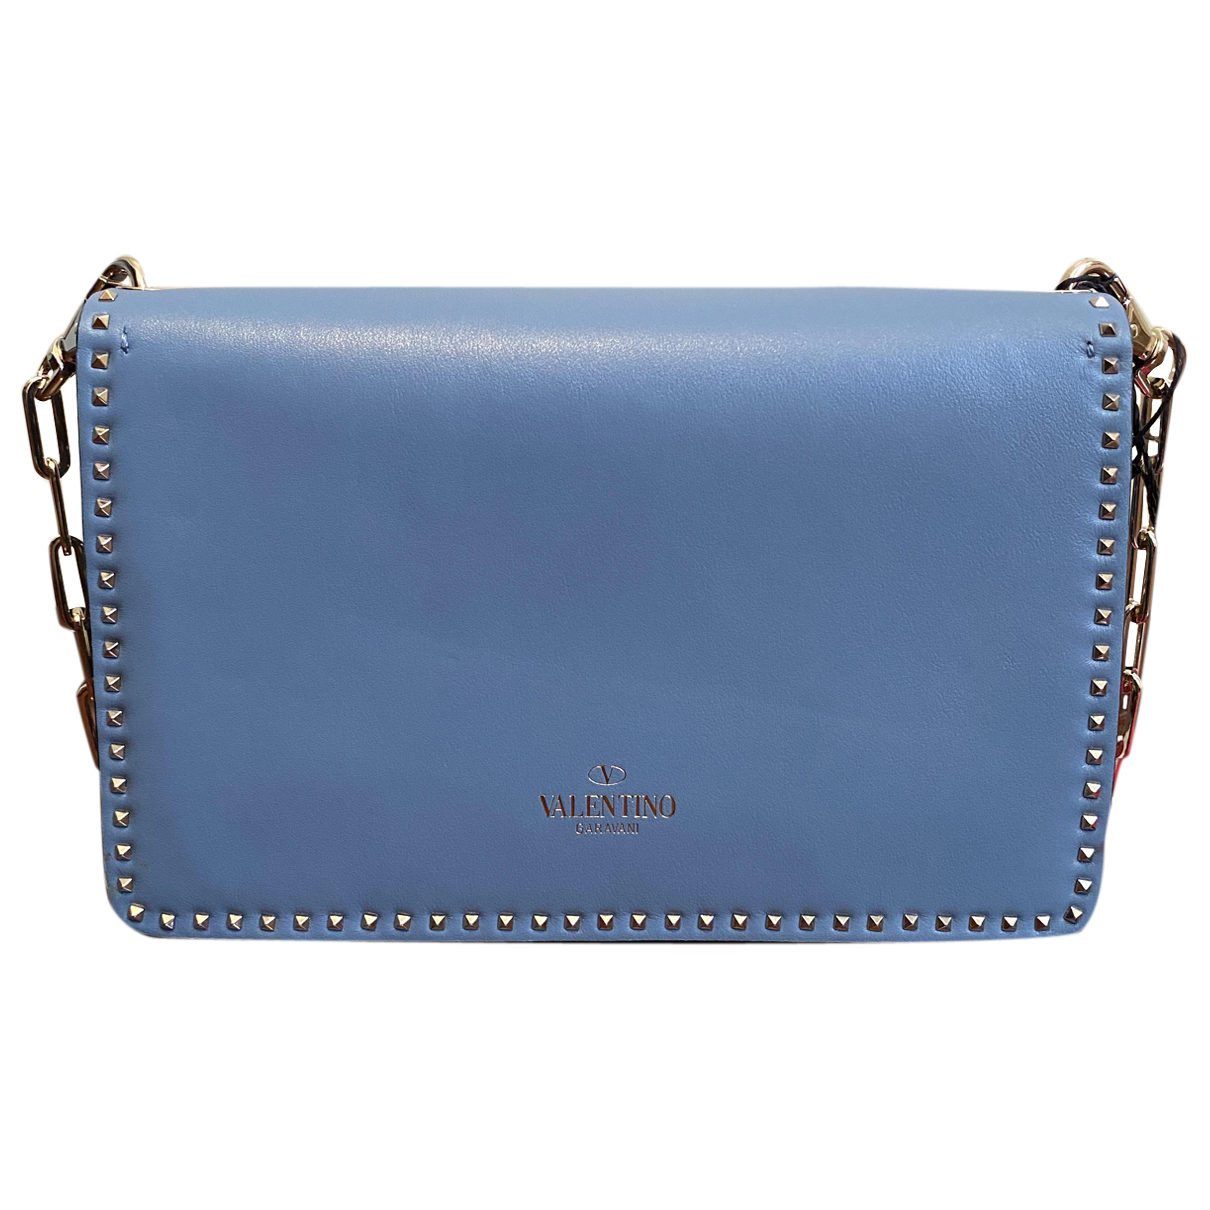 Valentino Garavani Rockstud Turquoise Leather Clutch bag for Women N